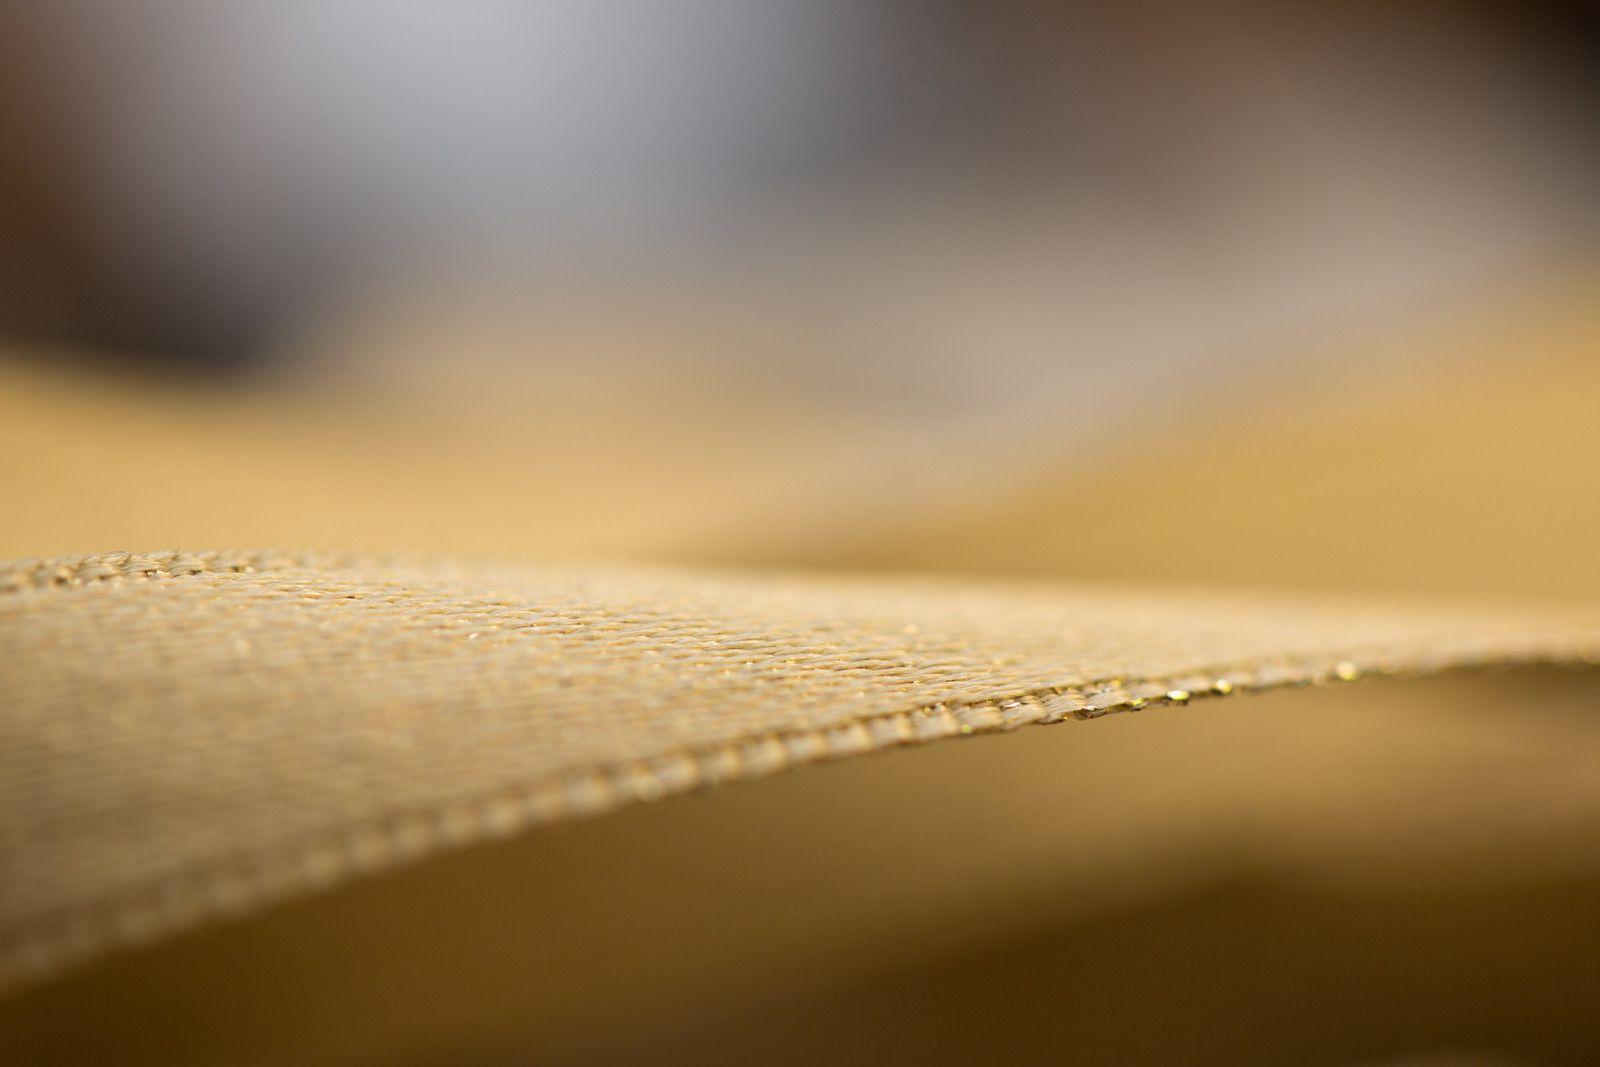 L'atelier de corseterie en gros plan